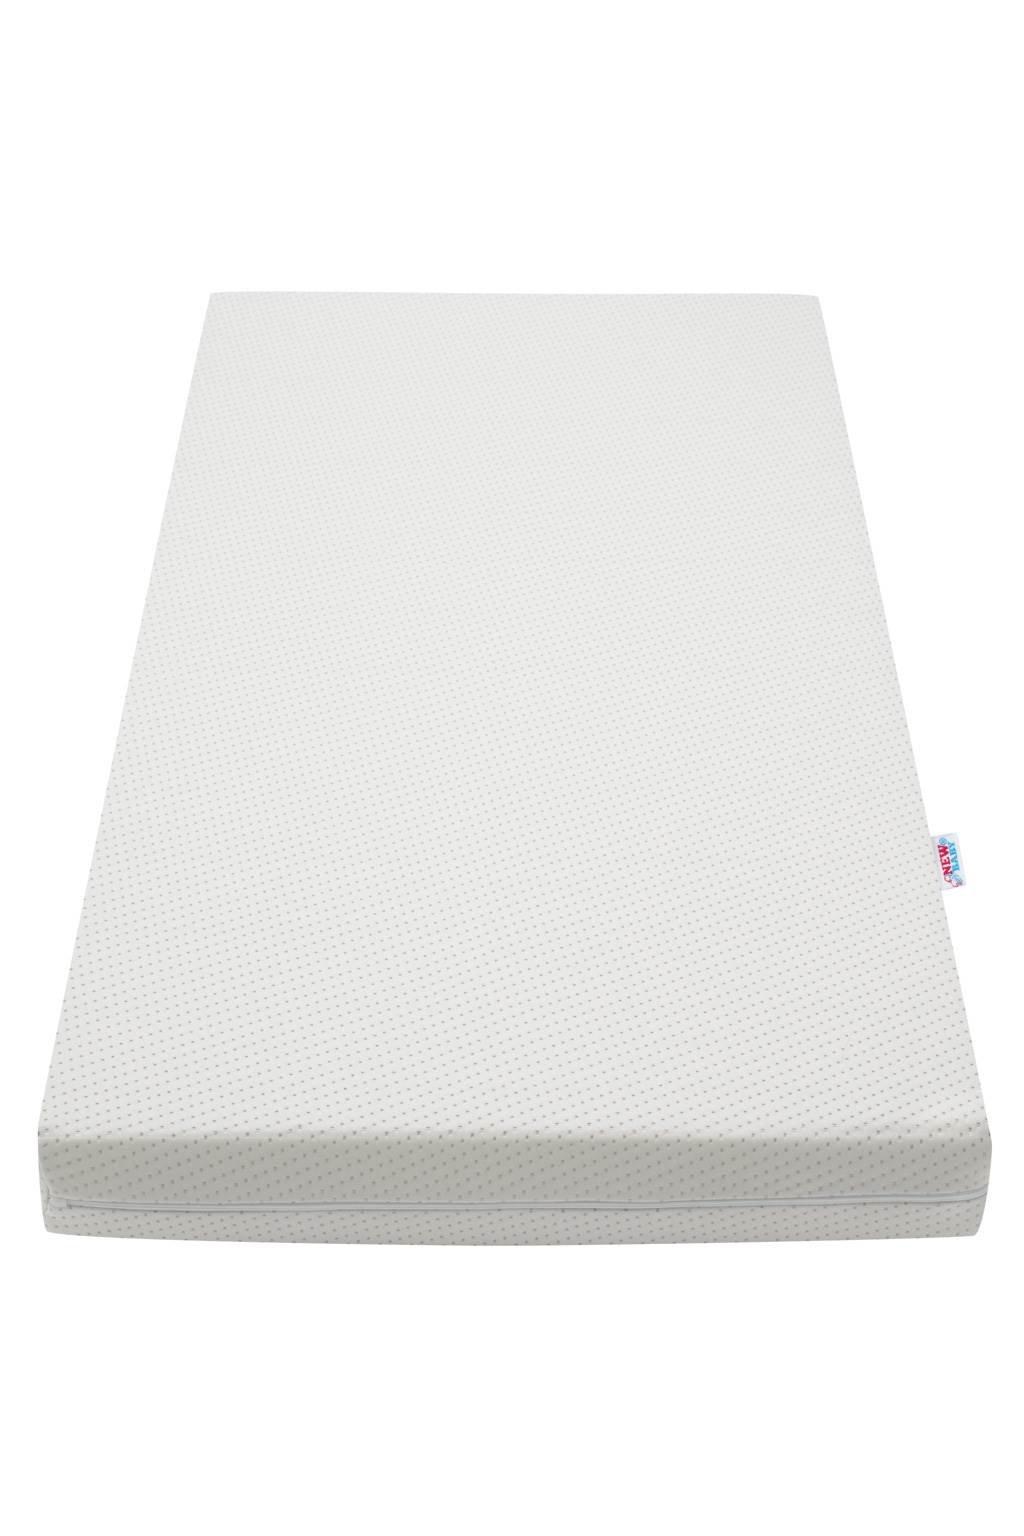 Detský penový matrac New Baby FLORIDA 120x60x10